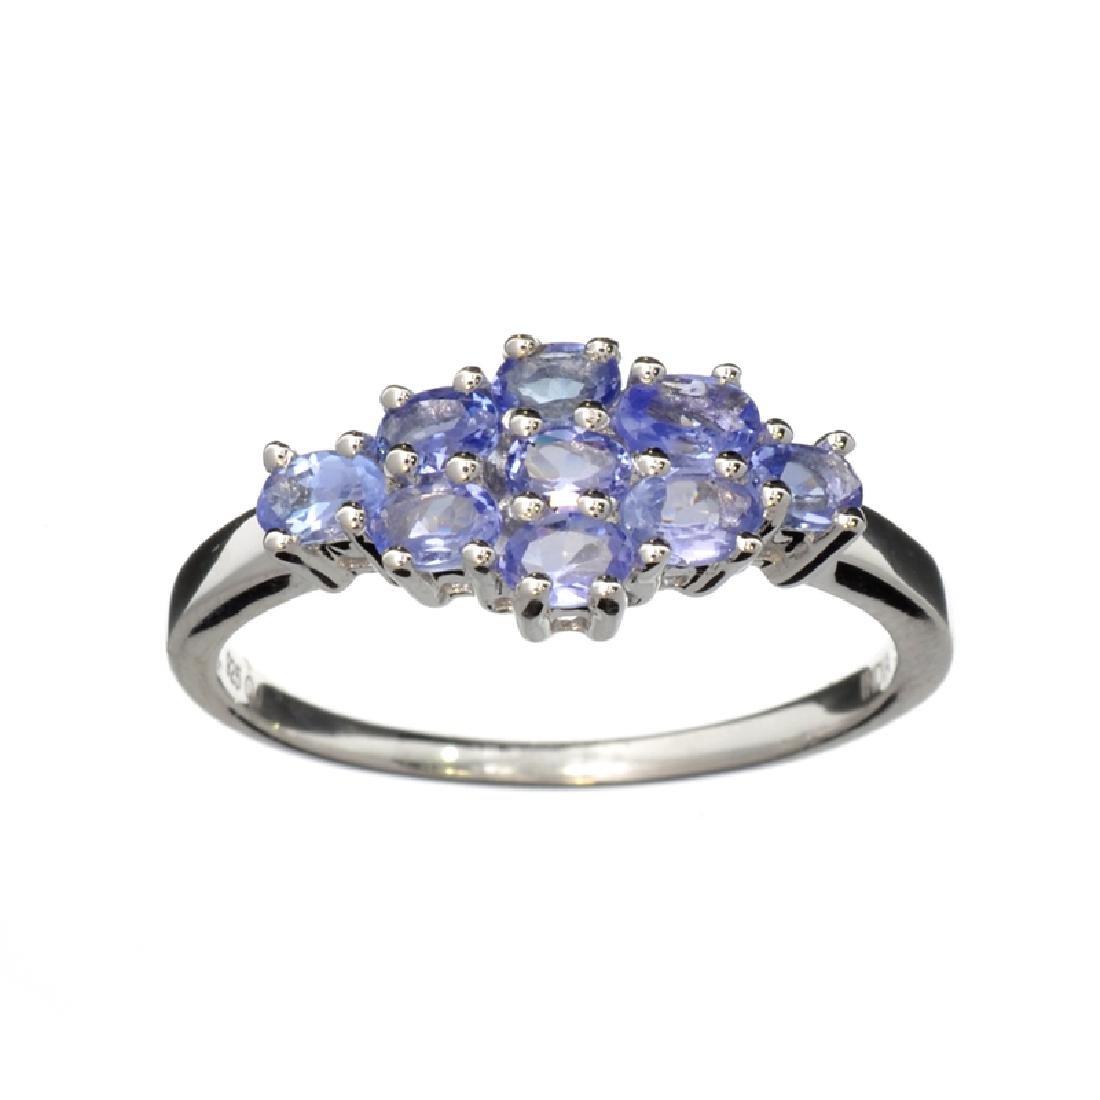 APP: 0.9k Fine Jewelry 3.00CT Oval Cut Almandite Garnet